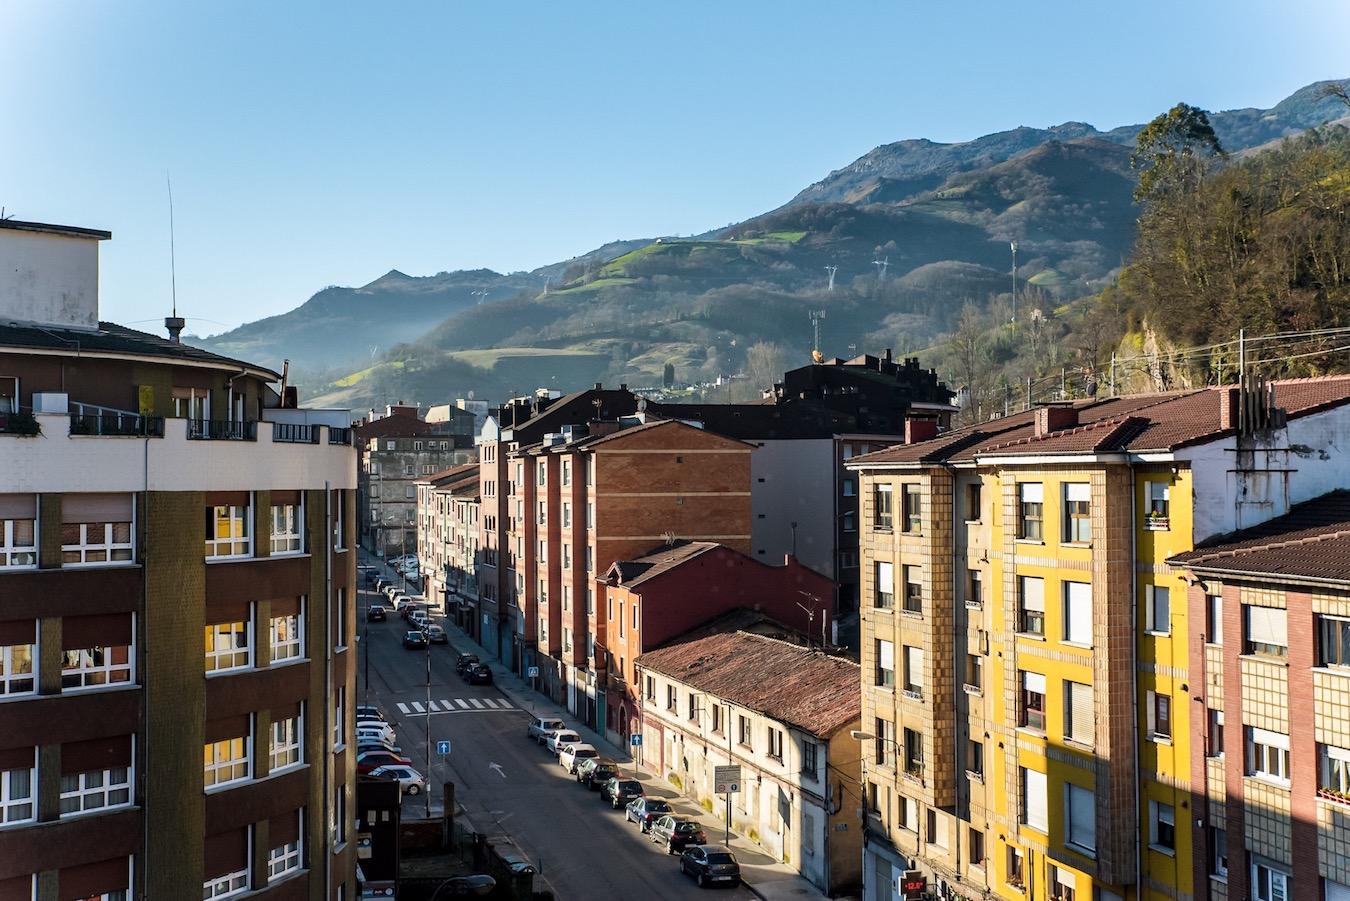 Pola de Lena, Asturias, Northern Spain.